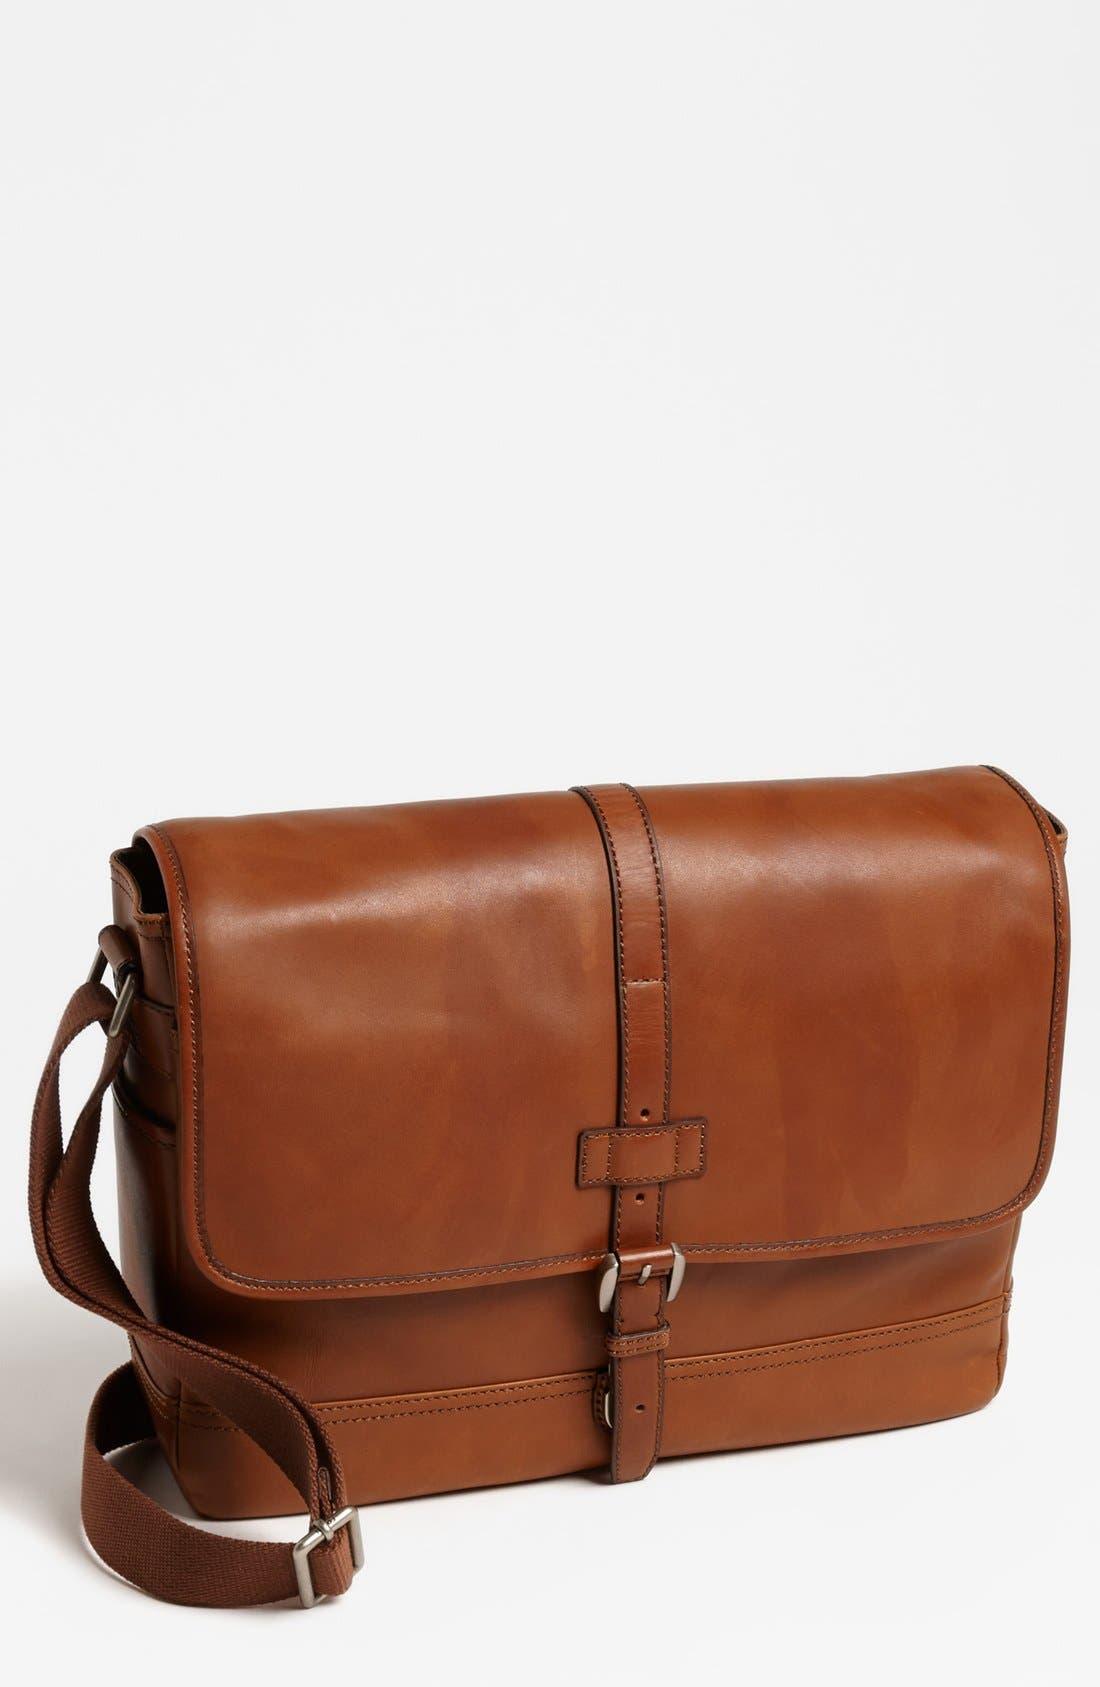 Main Image - Fossil 'Emerson' Messenger Bag